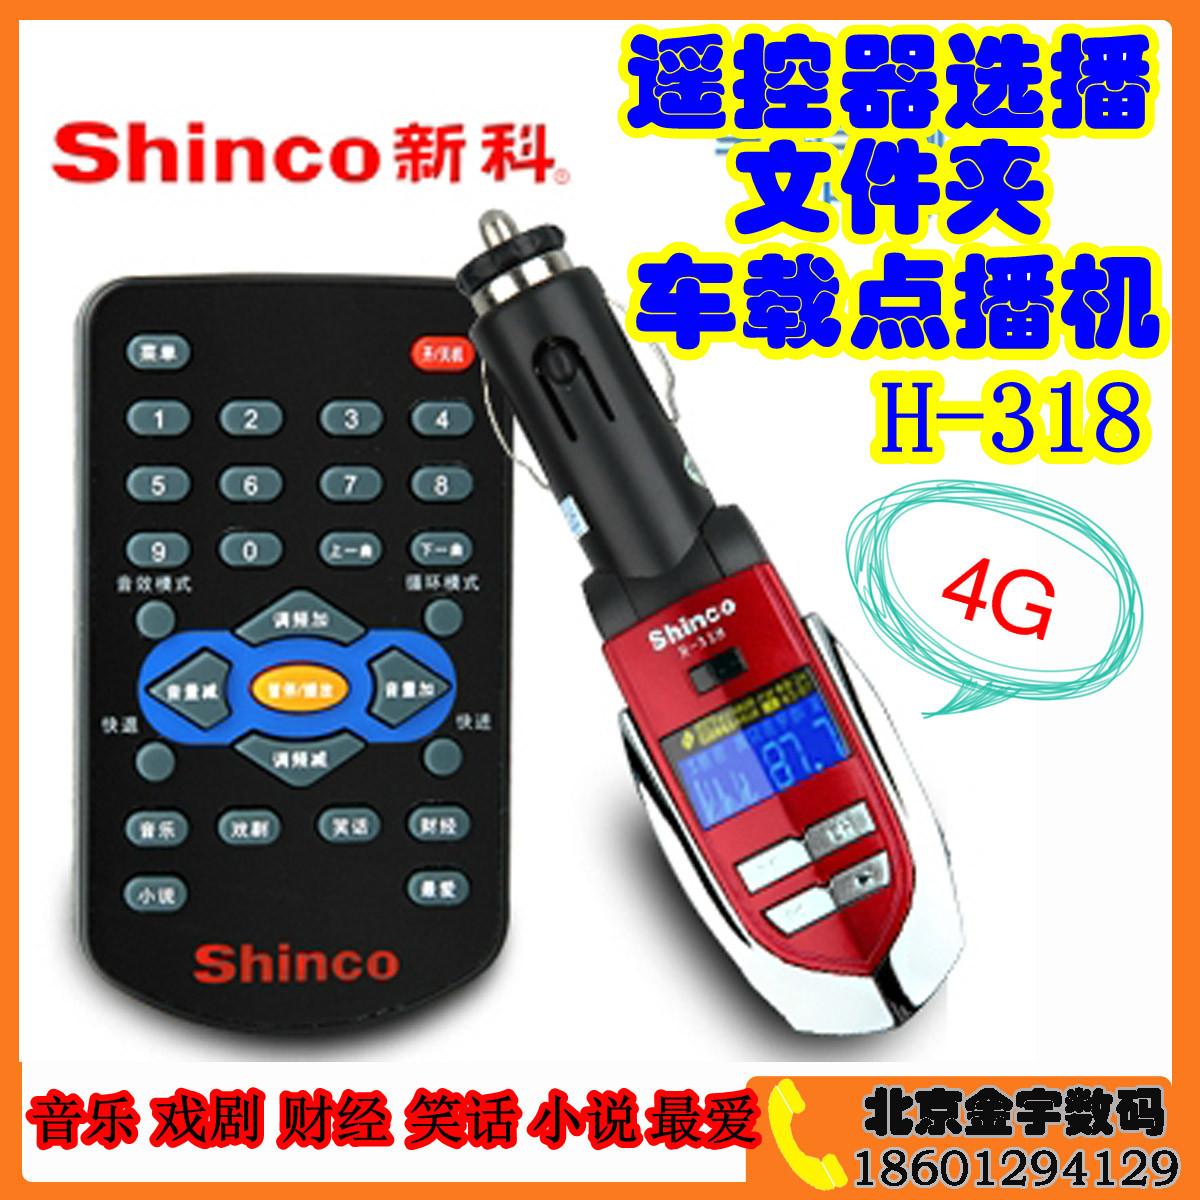 FM модулятор Shinco  H-318 4G MP3